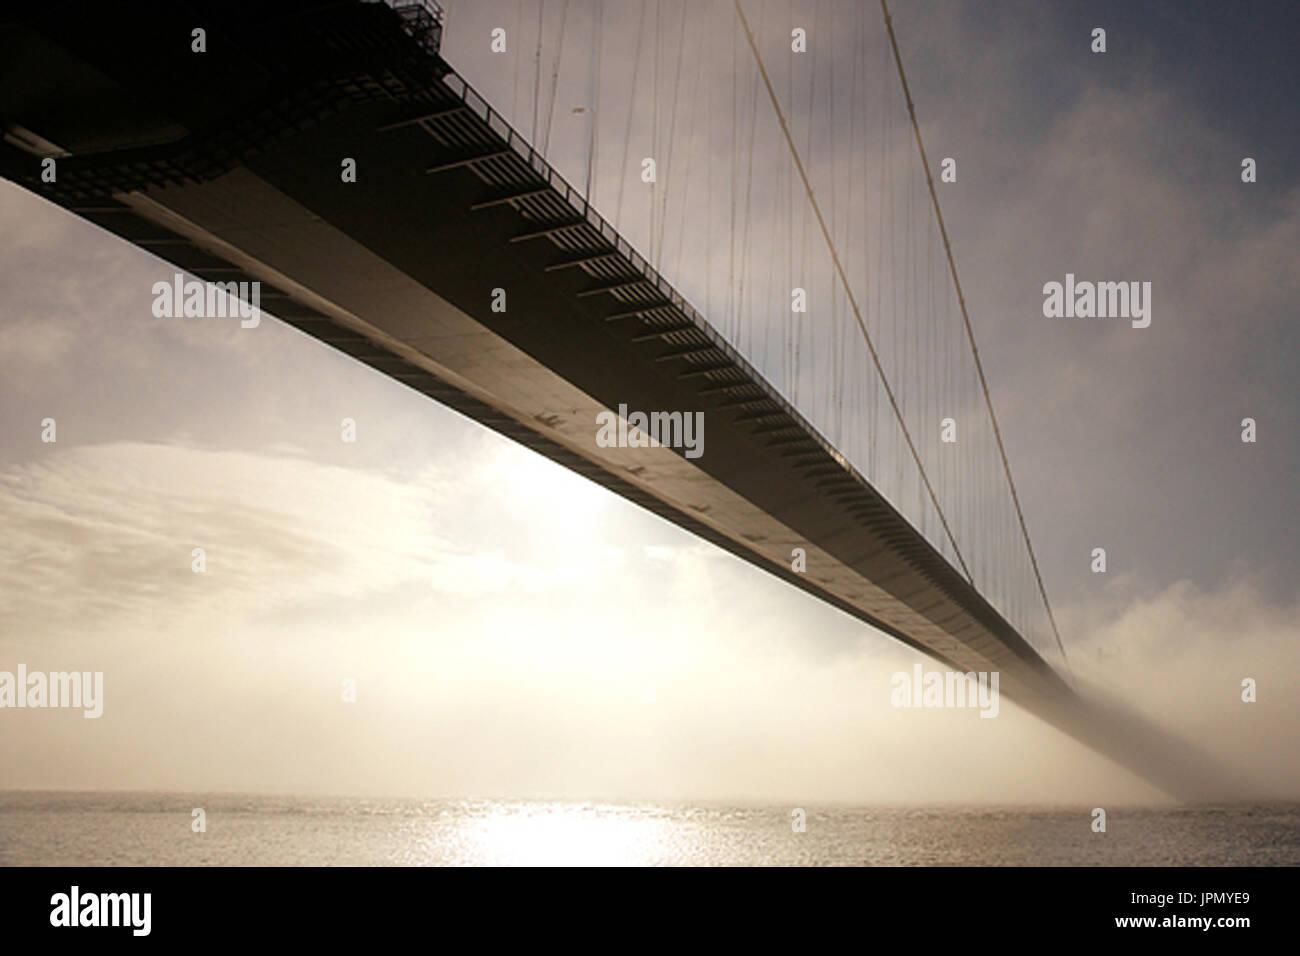 Humber Bridge im Nebel Bank, der Kunst, der Humber-mündung Stockbild